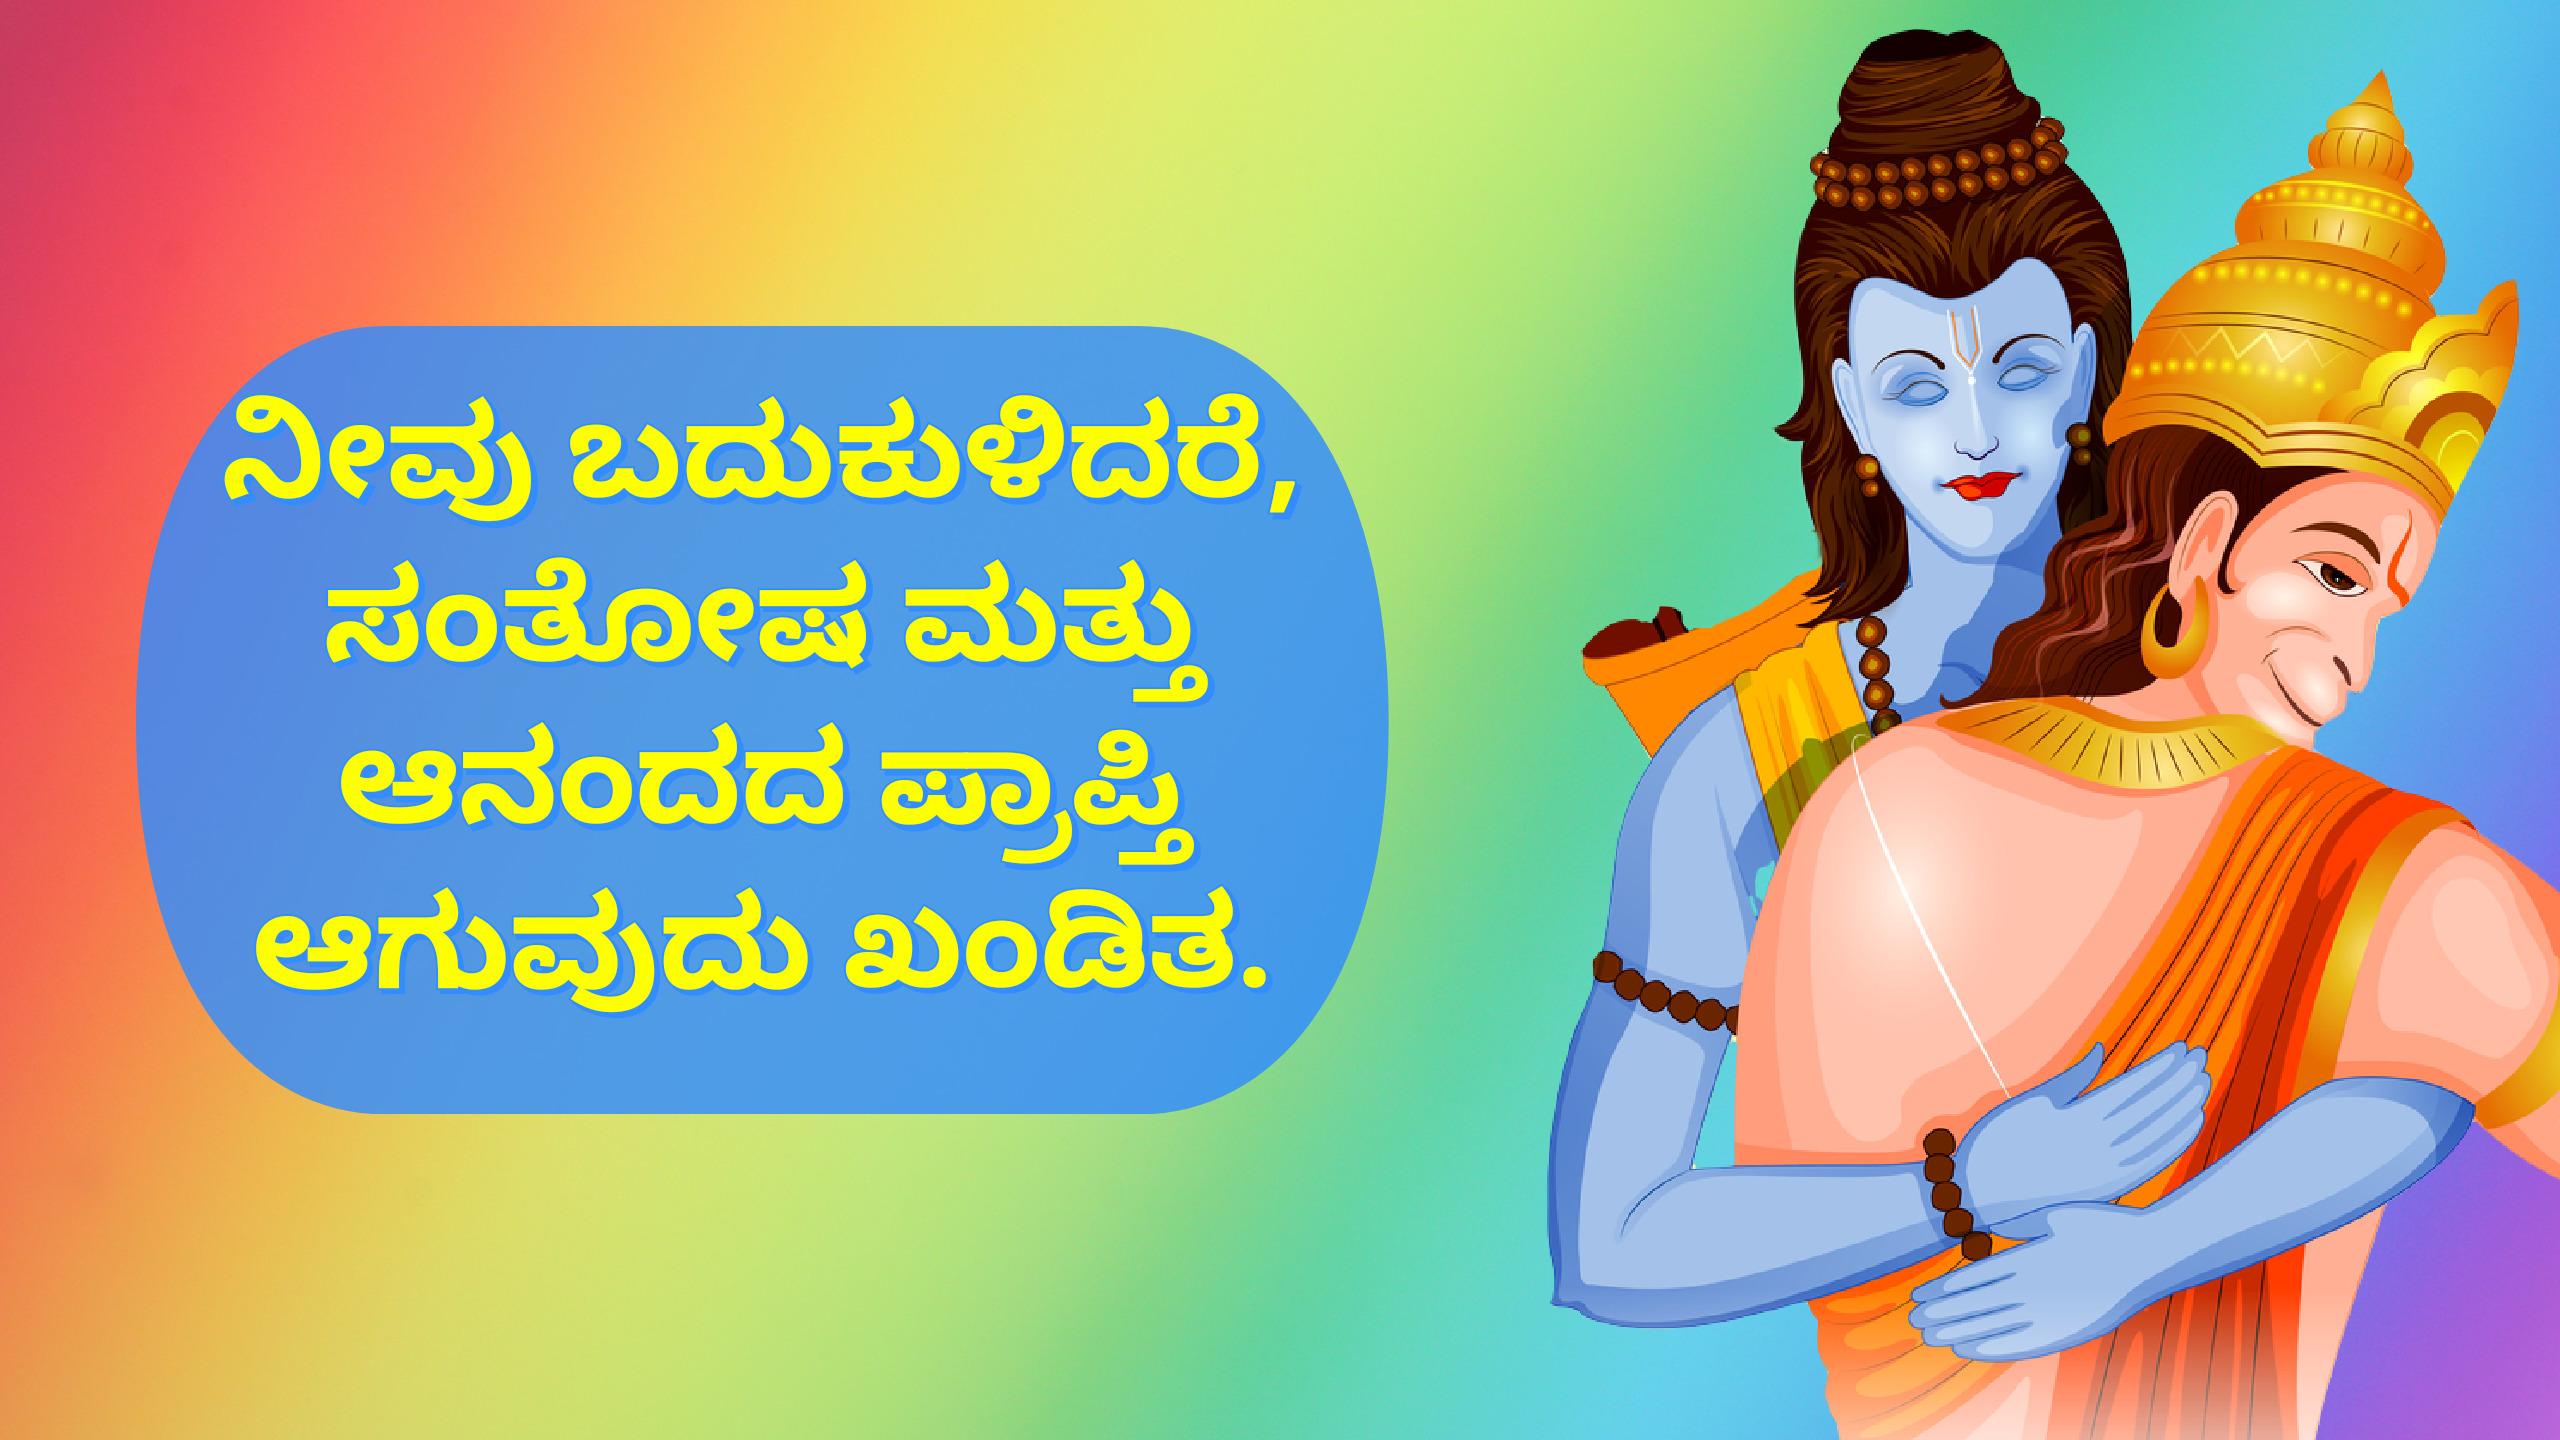 12. Shree Ram Quotes in Kannada